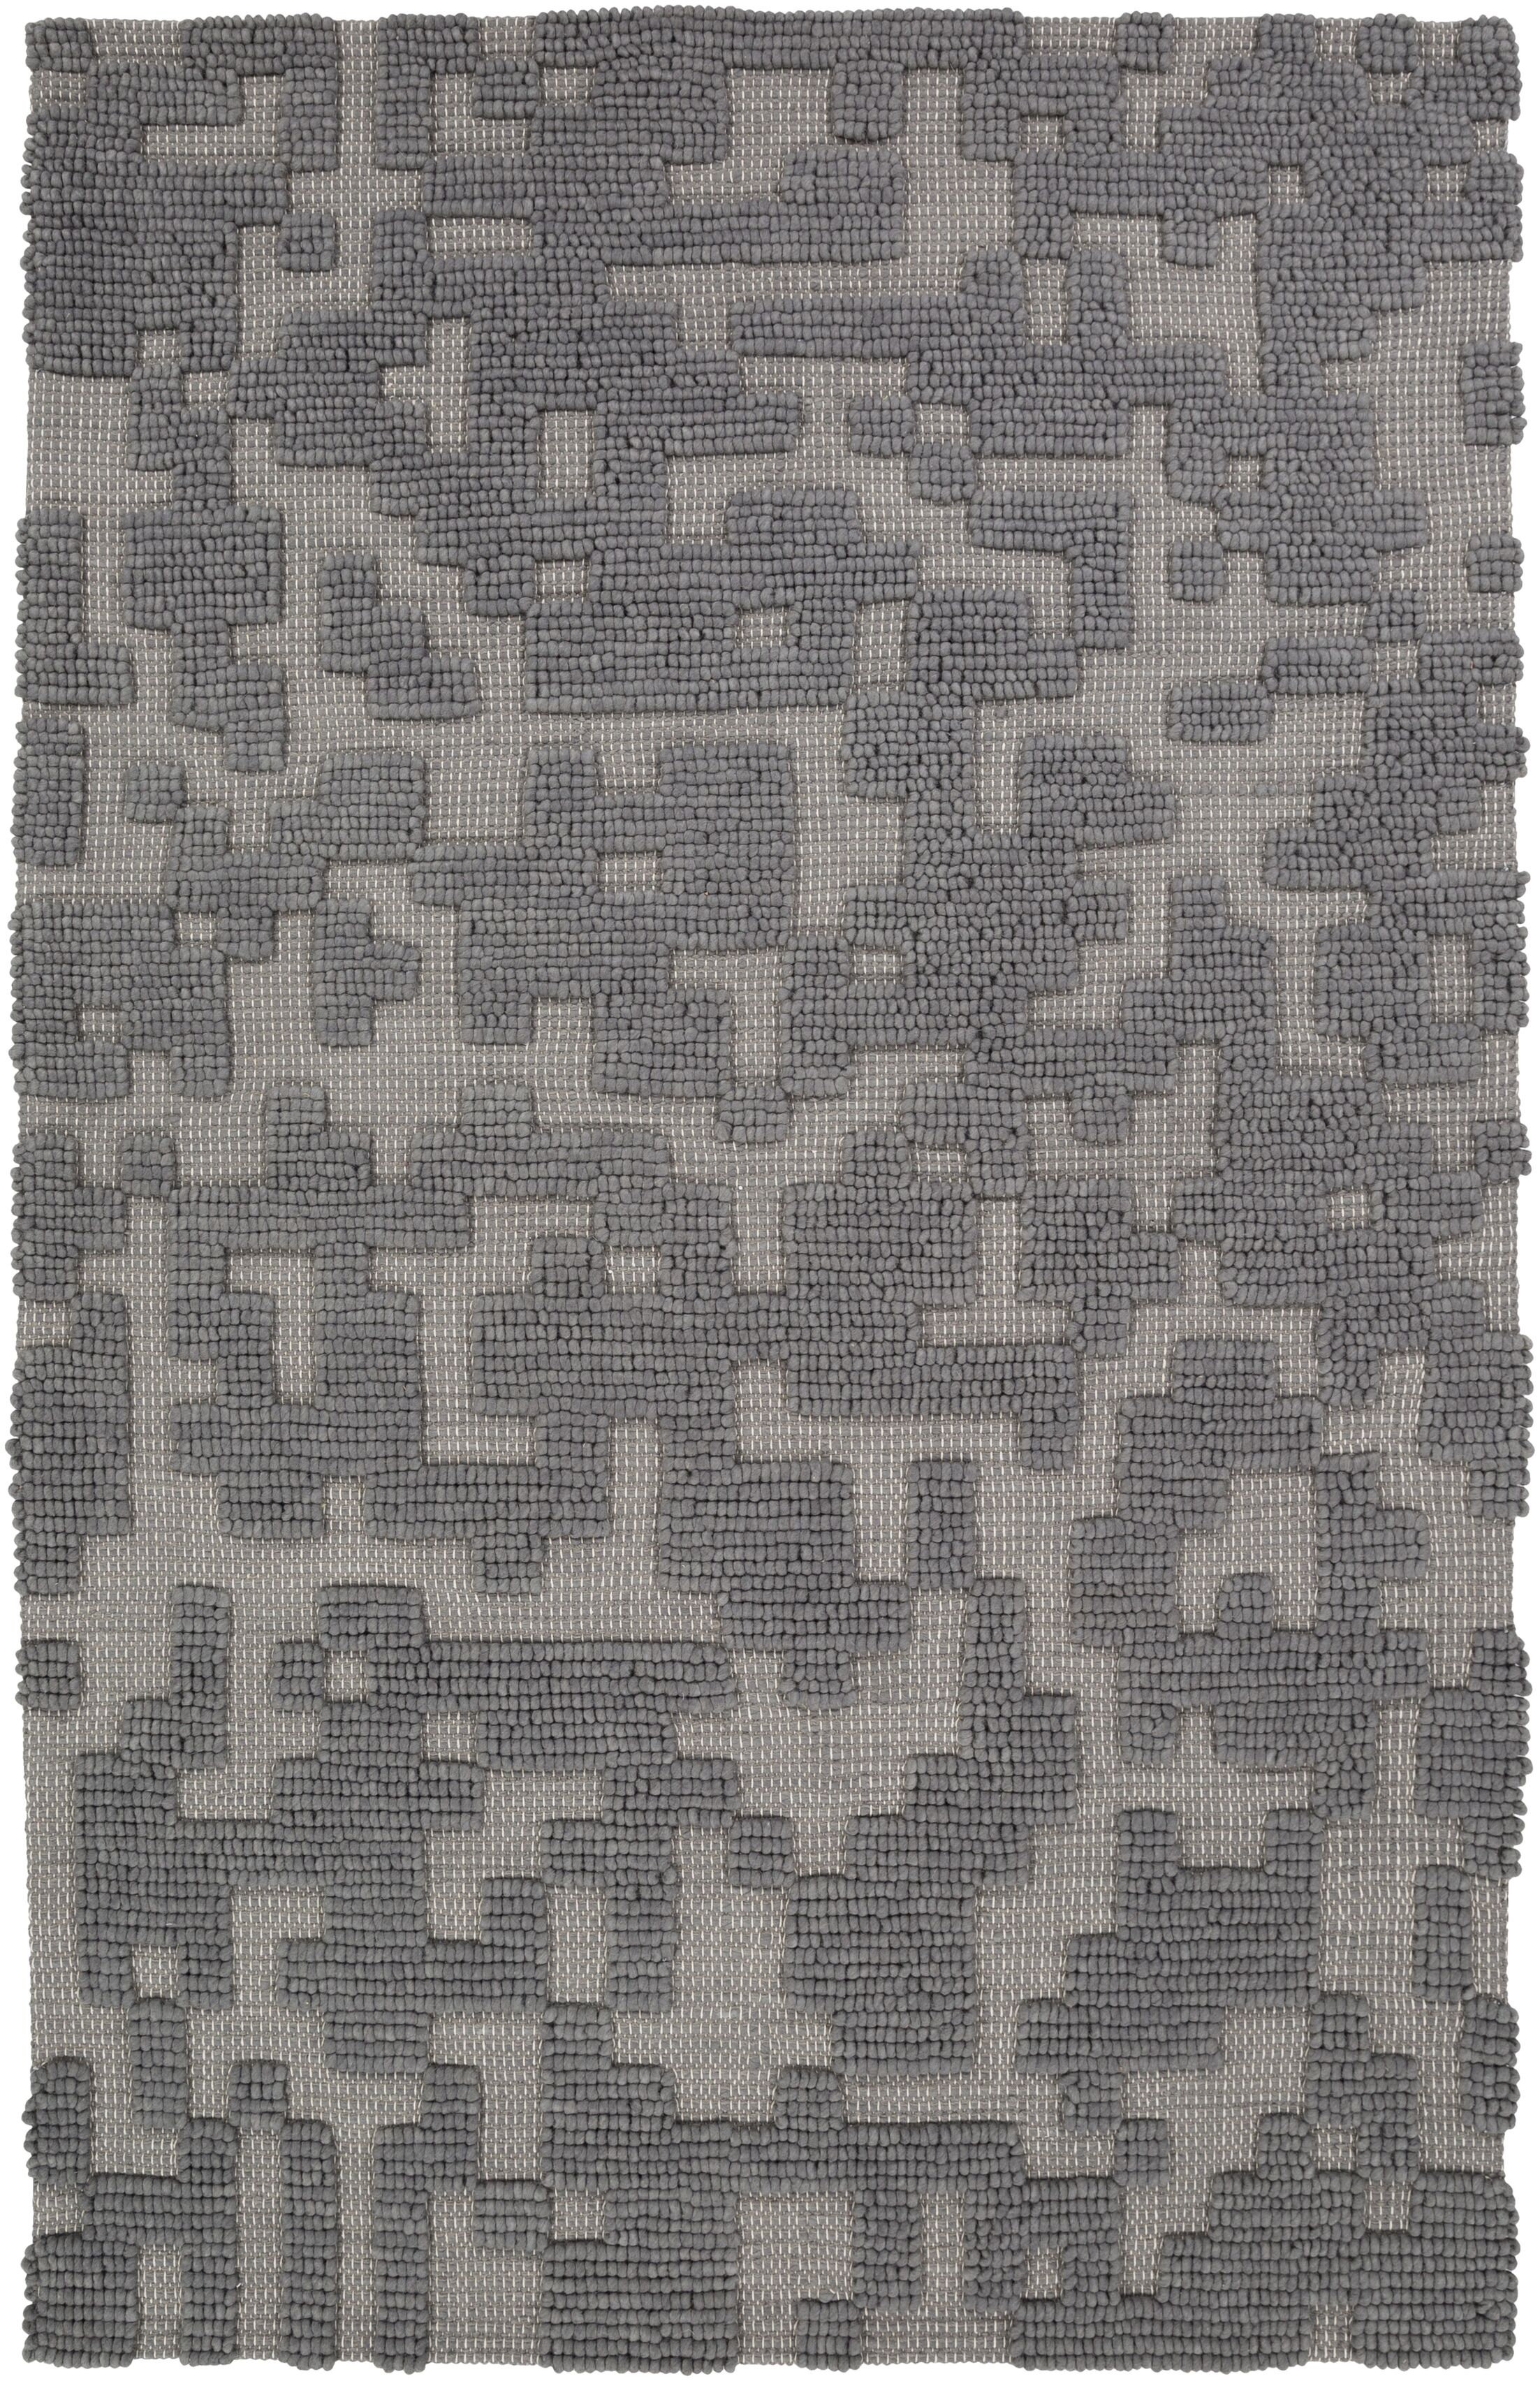 Edmonson Handmade Gray Area Rug Rug Size: Rectangle 8' x 11'